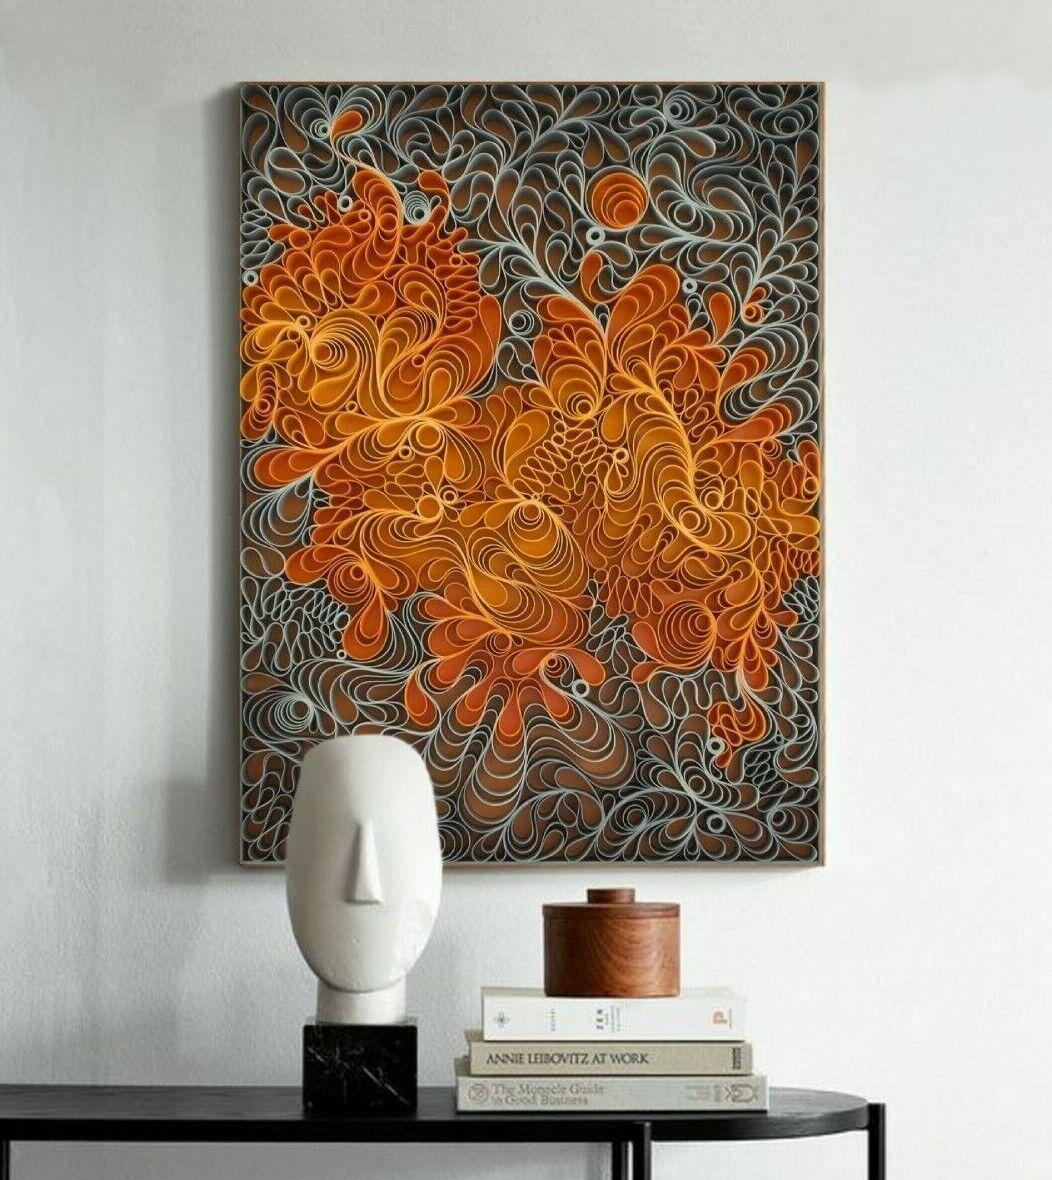 XL LEINWAND BILD 100x75x5 Orange GRAU WANDBILD 3D MUSTER MODERN ART GEMÄLDE NEU